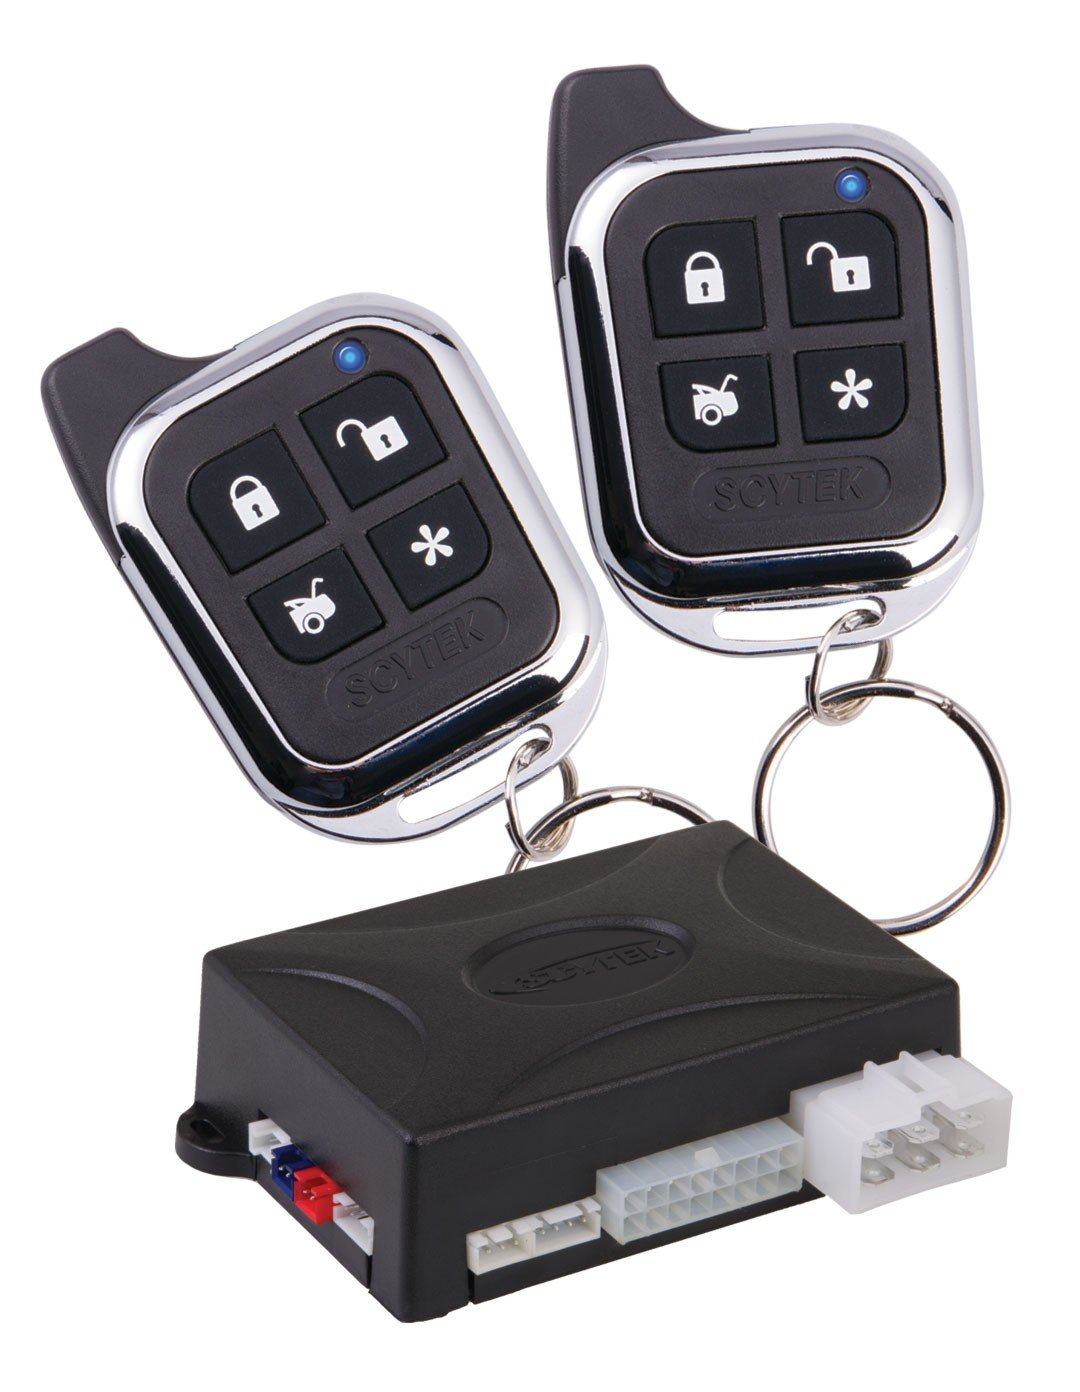 Scytek Car Alarm Wiring Diagram Astra 1000rs Complete Remote Engine Start System